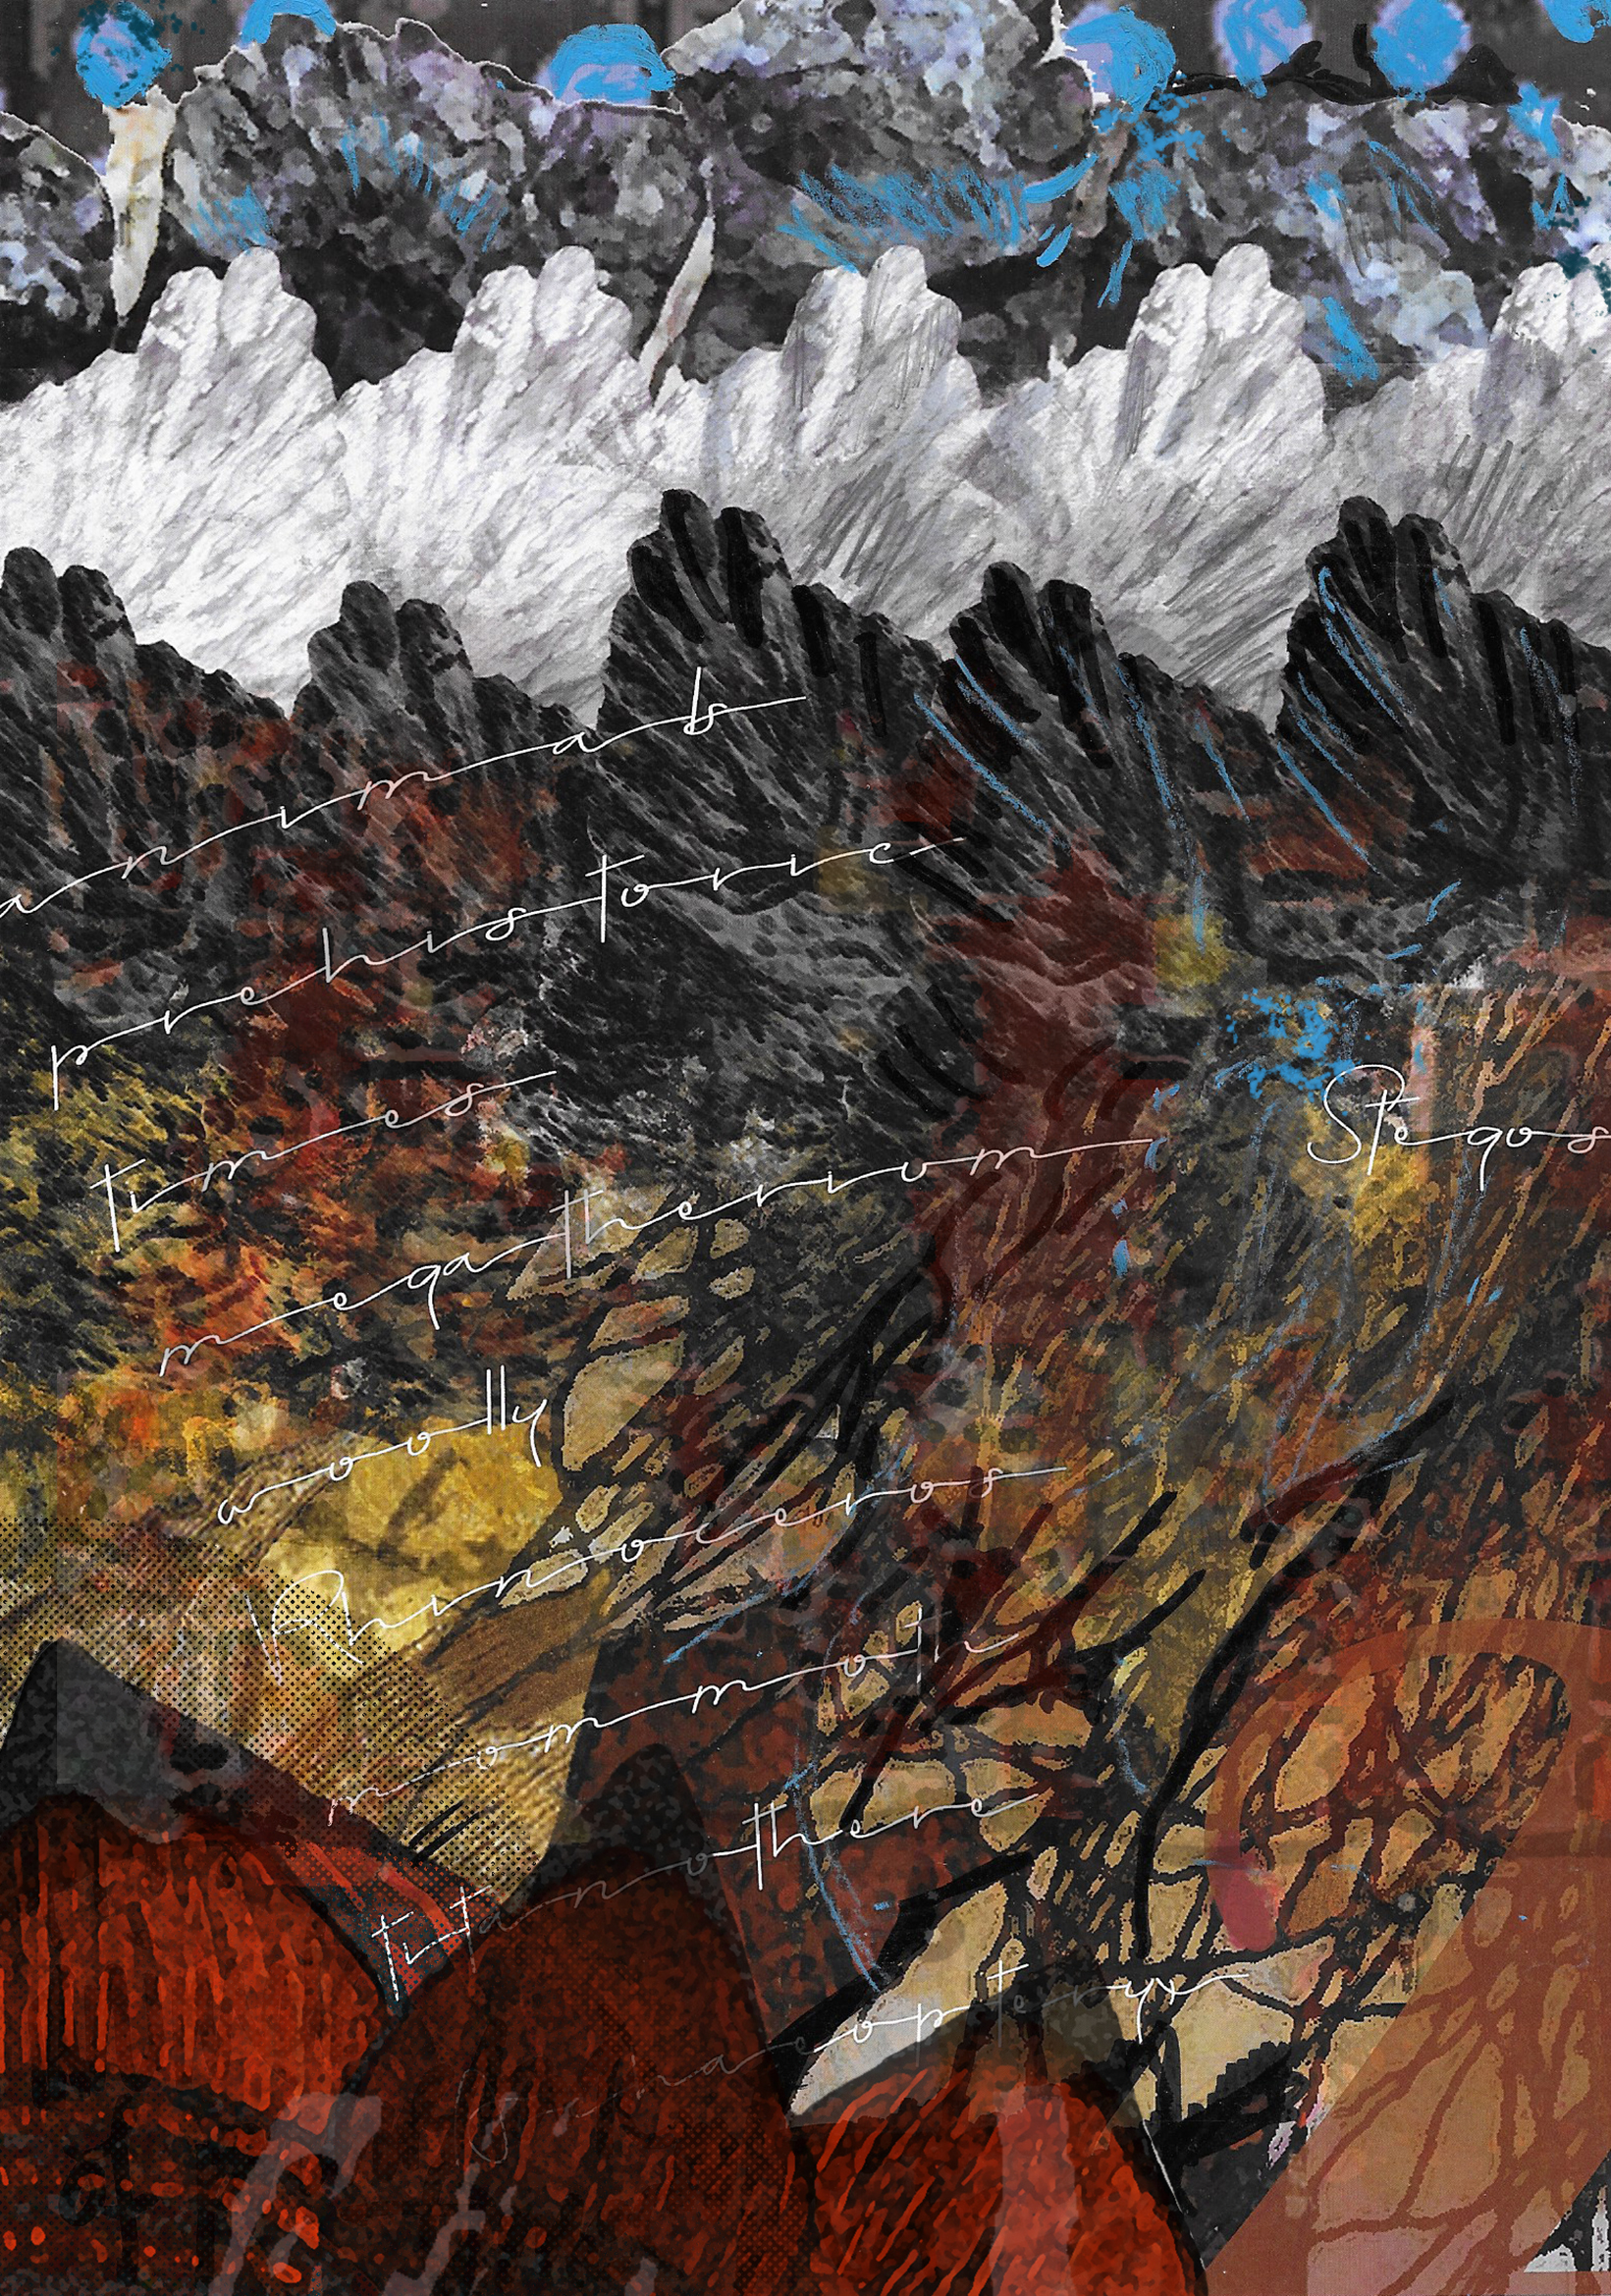 (54) Shauna Willett - Animals of Prehistoric Times - Plate 2, A Landscape Image